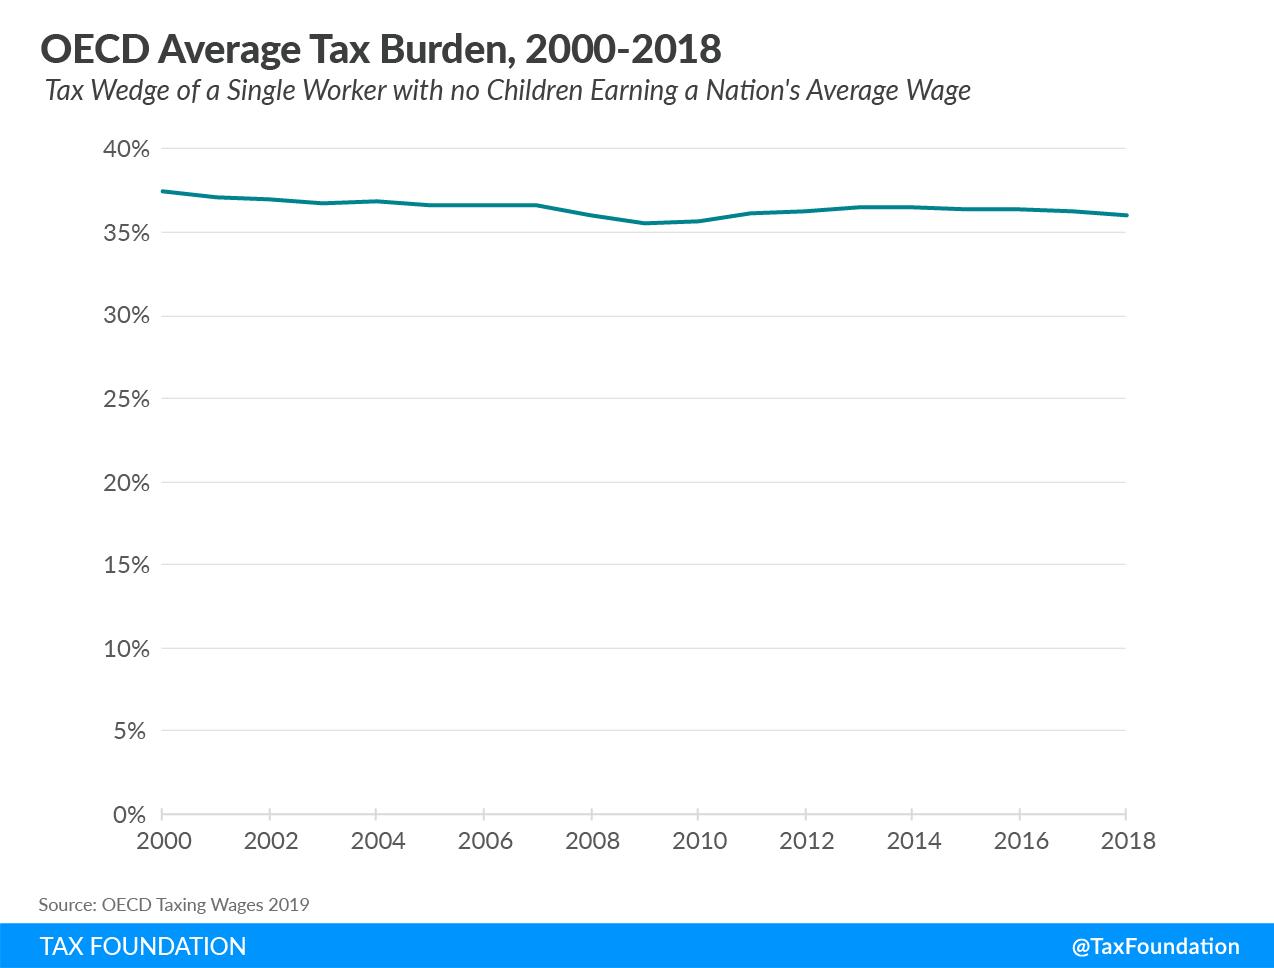 OECD average tax burden OECD tax wedge